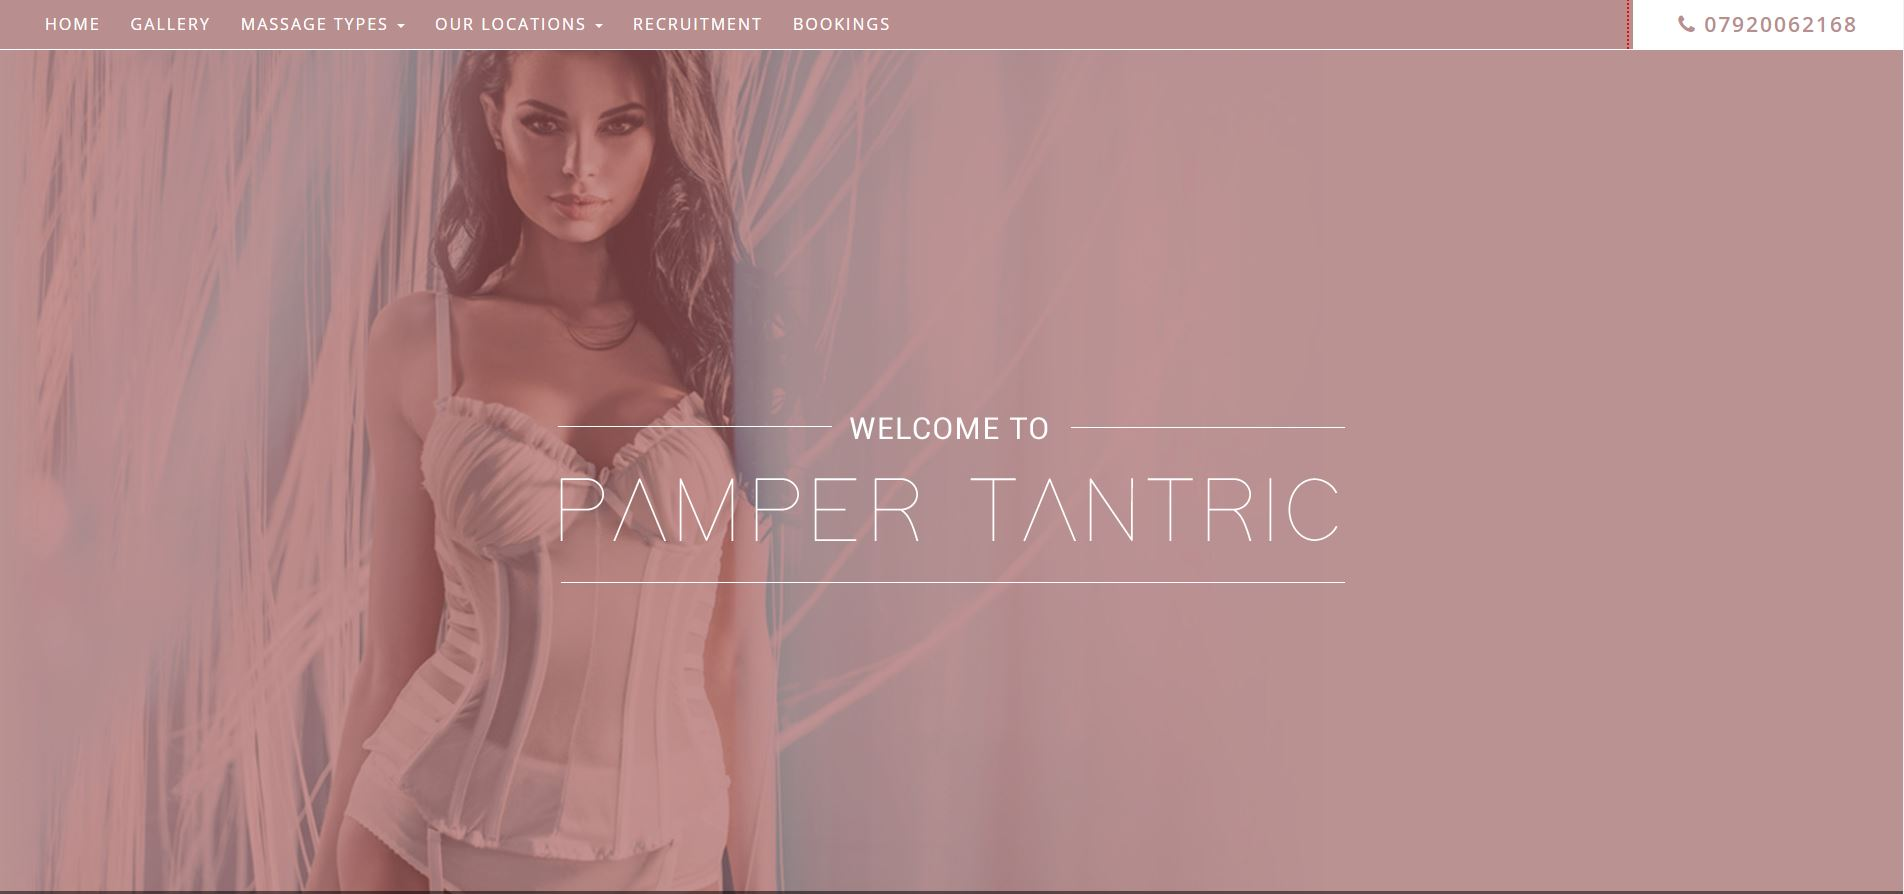 pamper tantric screenshot